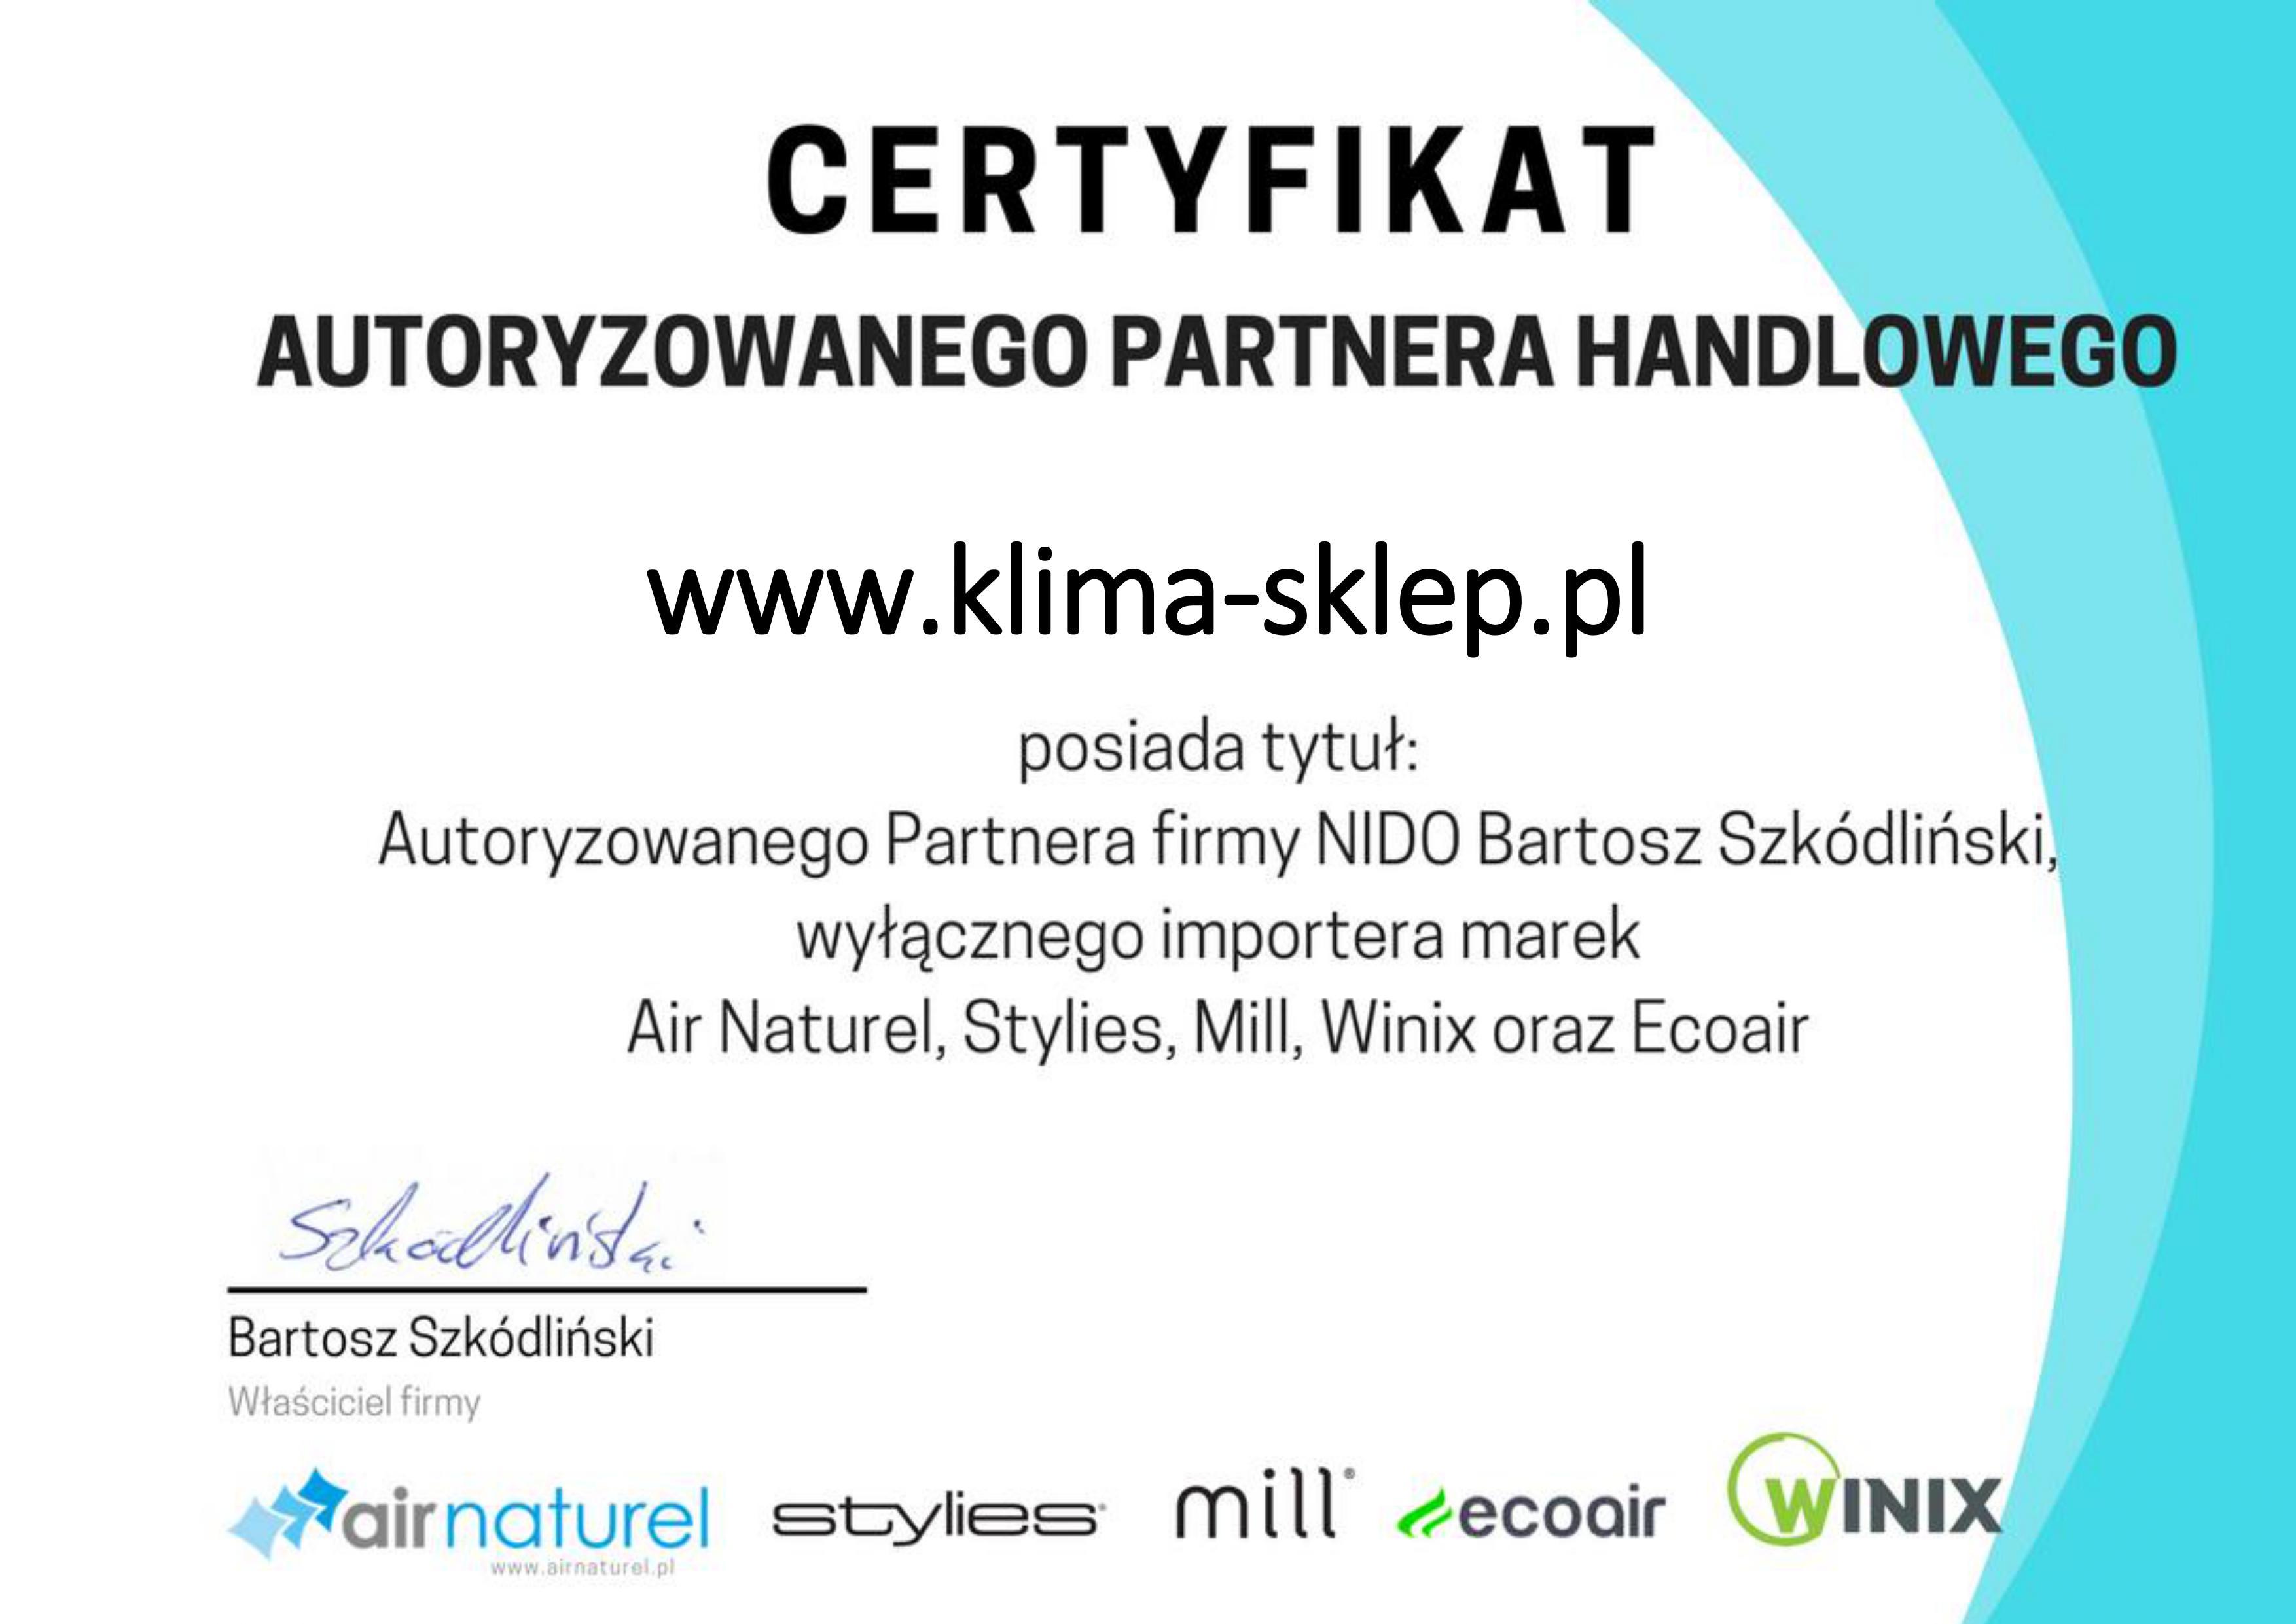 Certyfikat Airnaturel, Stylies